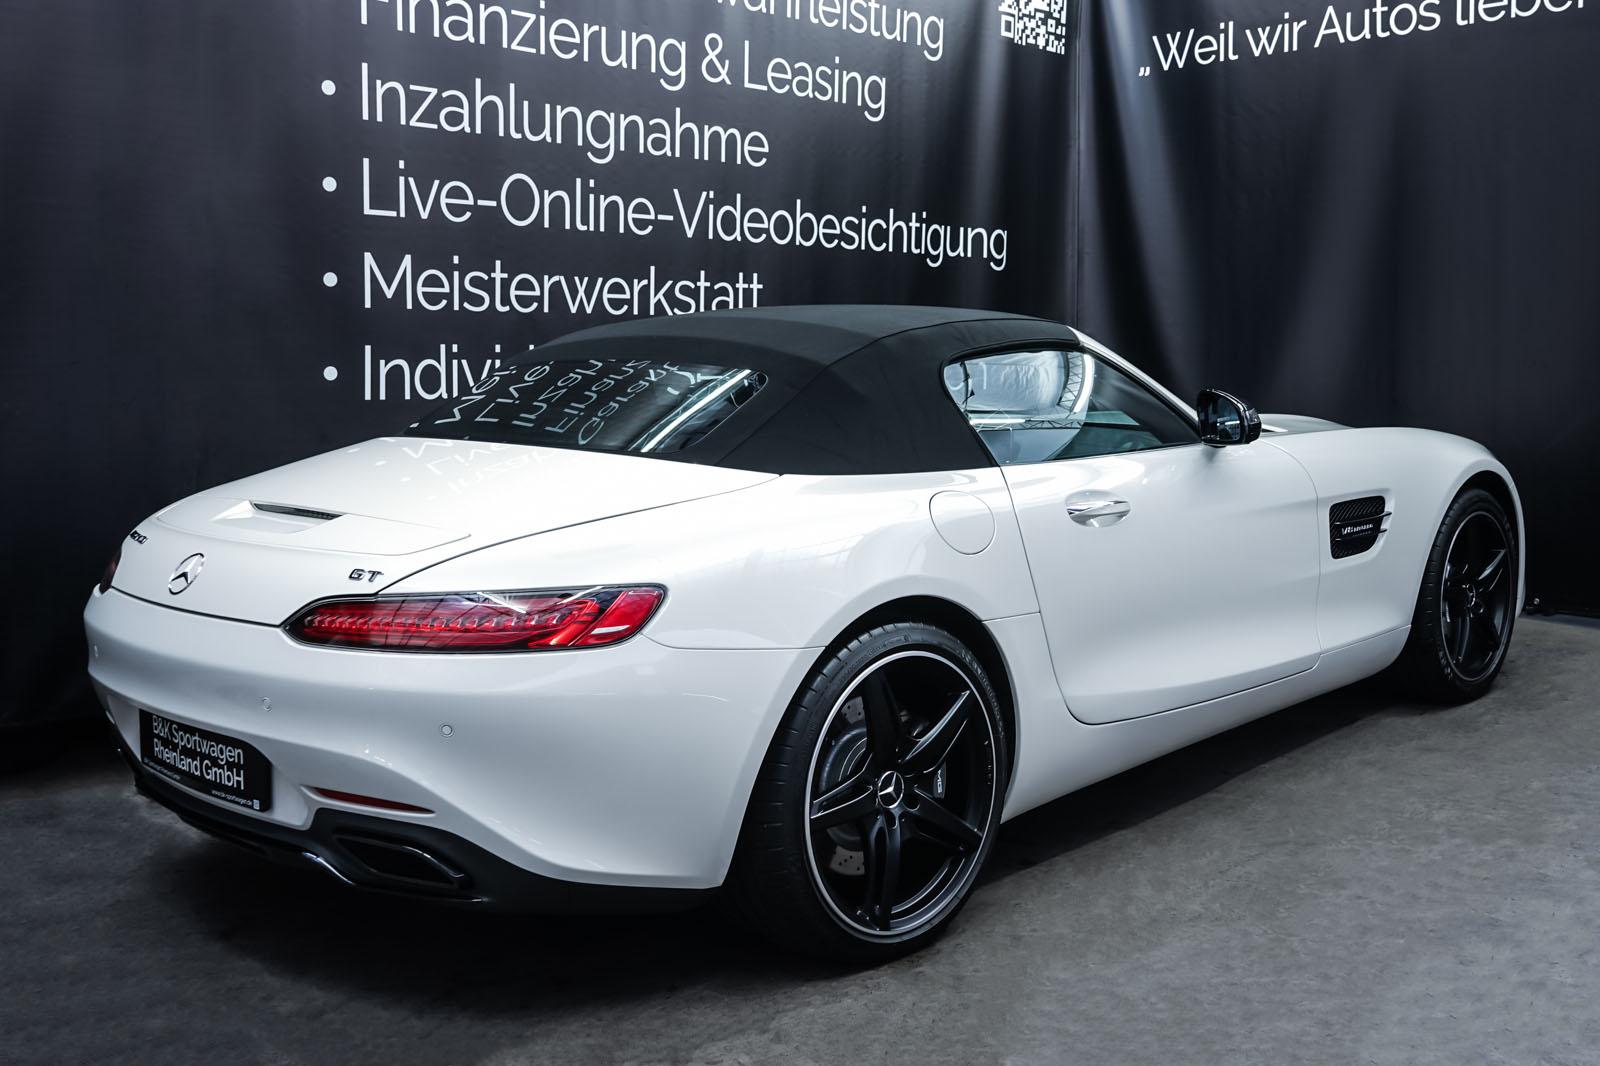 11Mercedes_Benz_AMG_GT_Roadster_Weiss_Schwarz_MB-9710_23_w